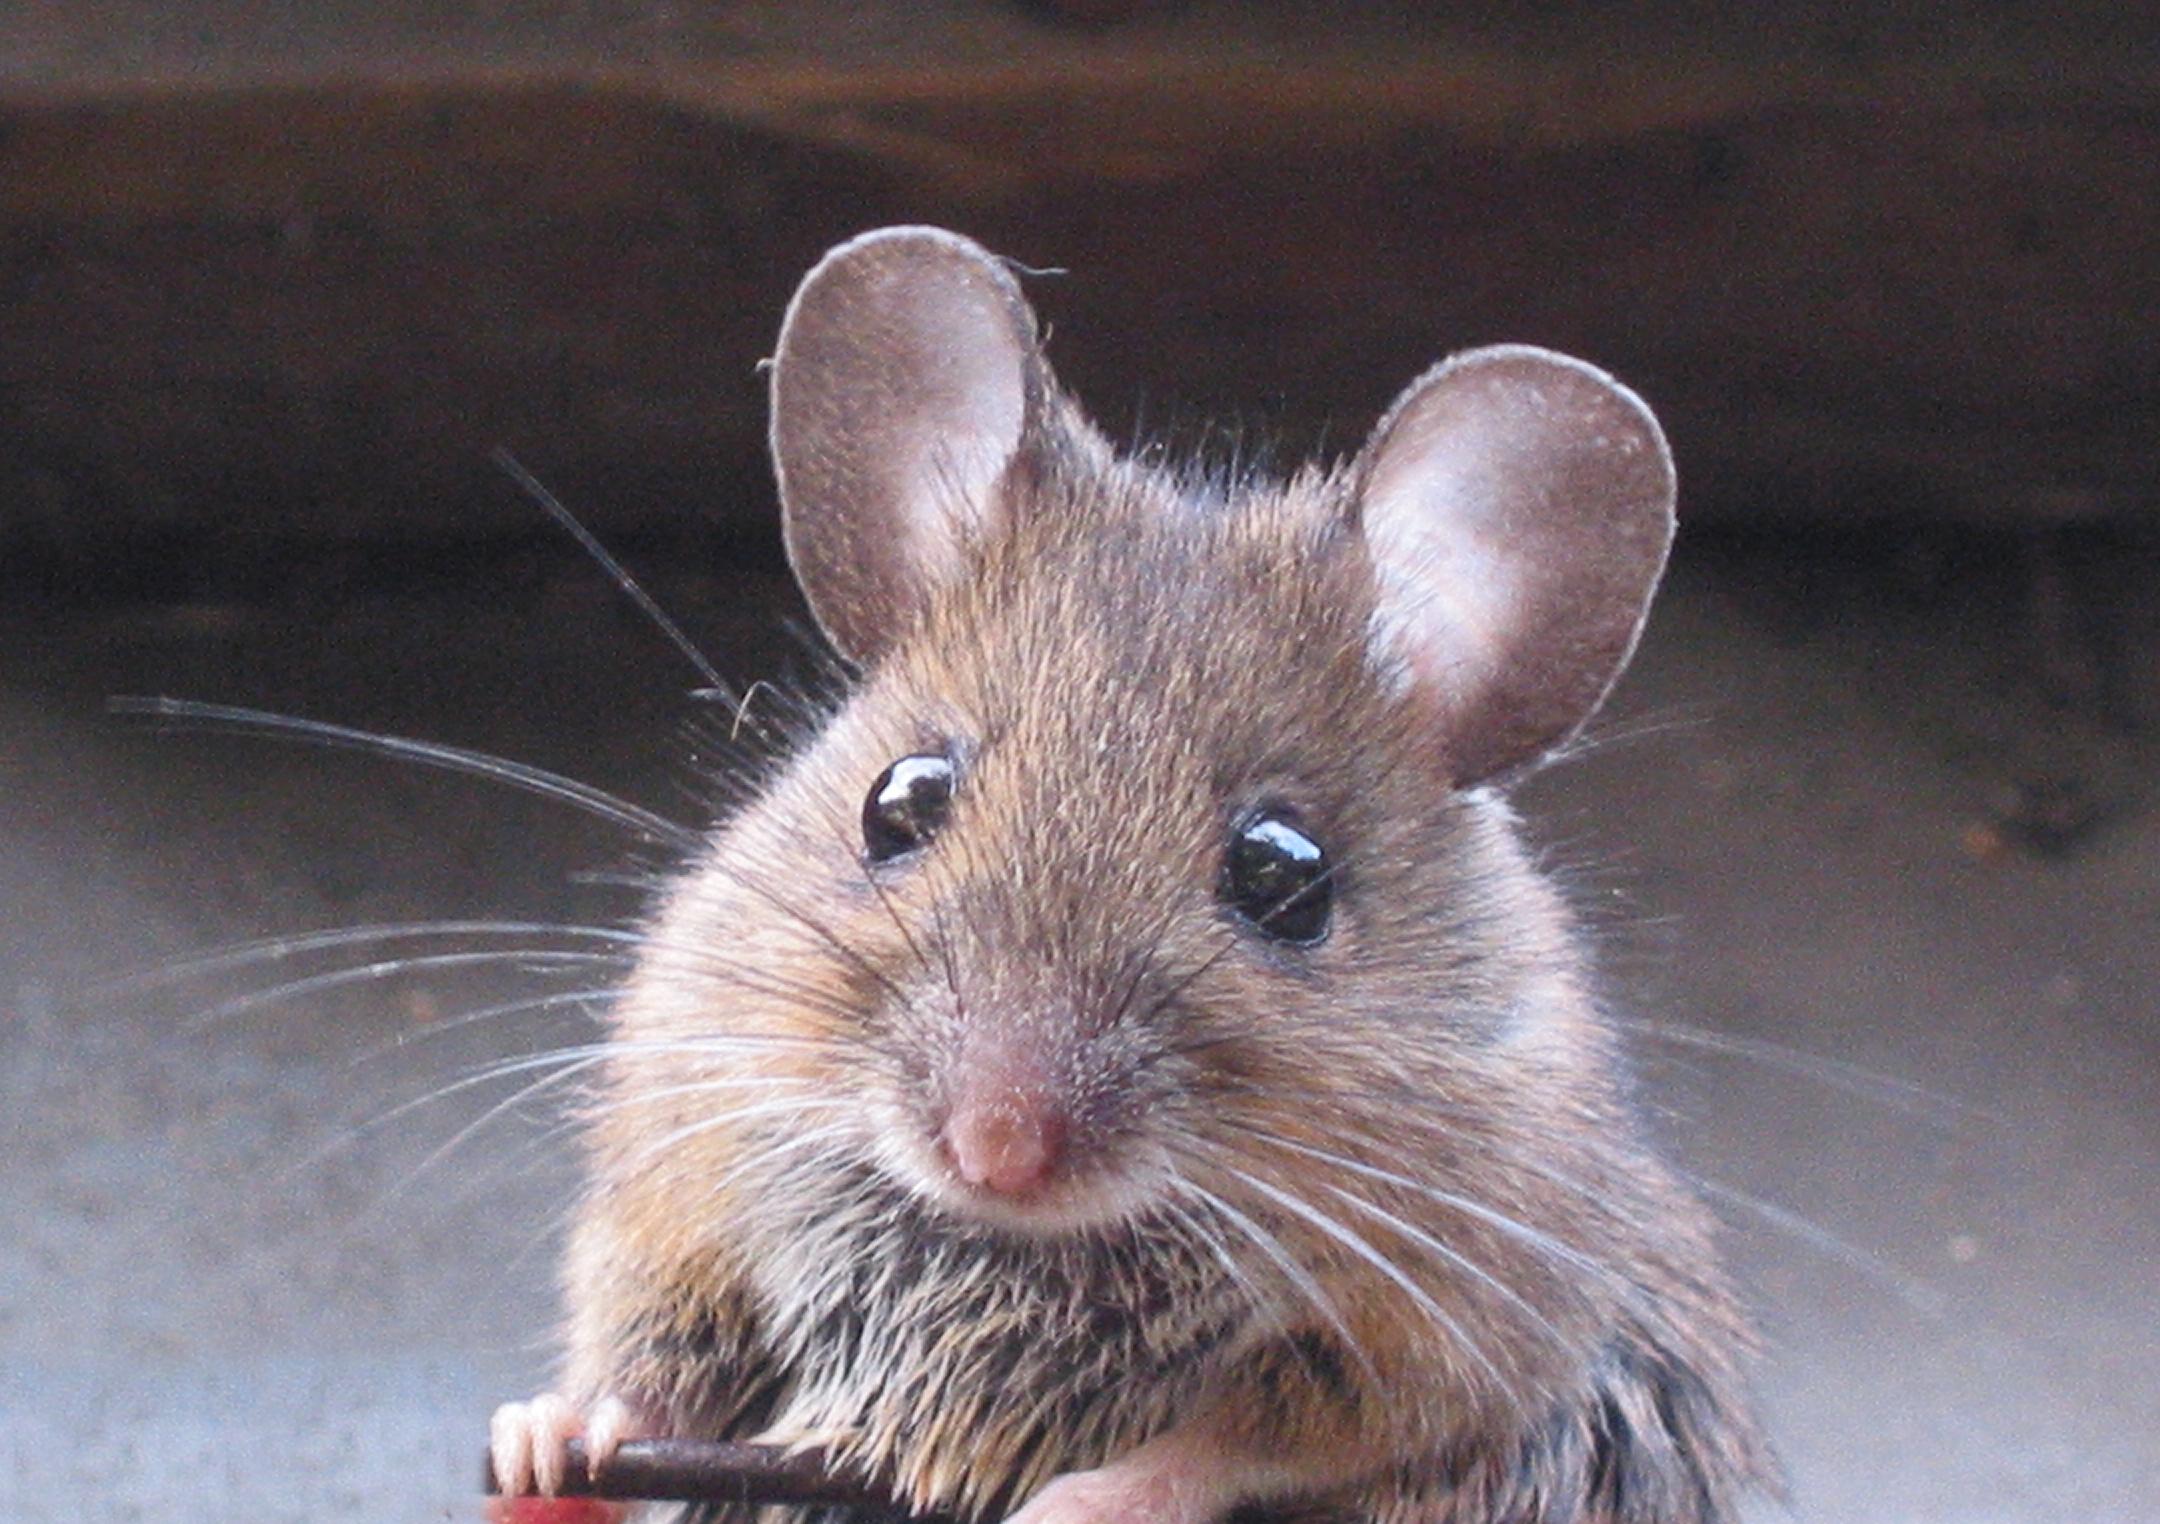 family Muridae - rats, mice, voles, gerbils, hamsters, etc ...